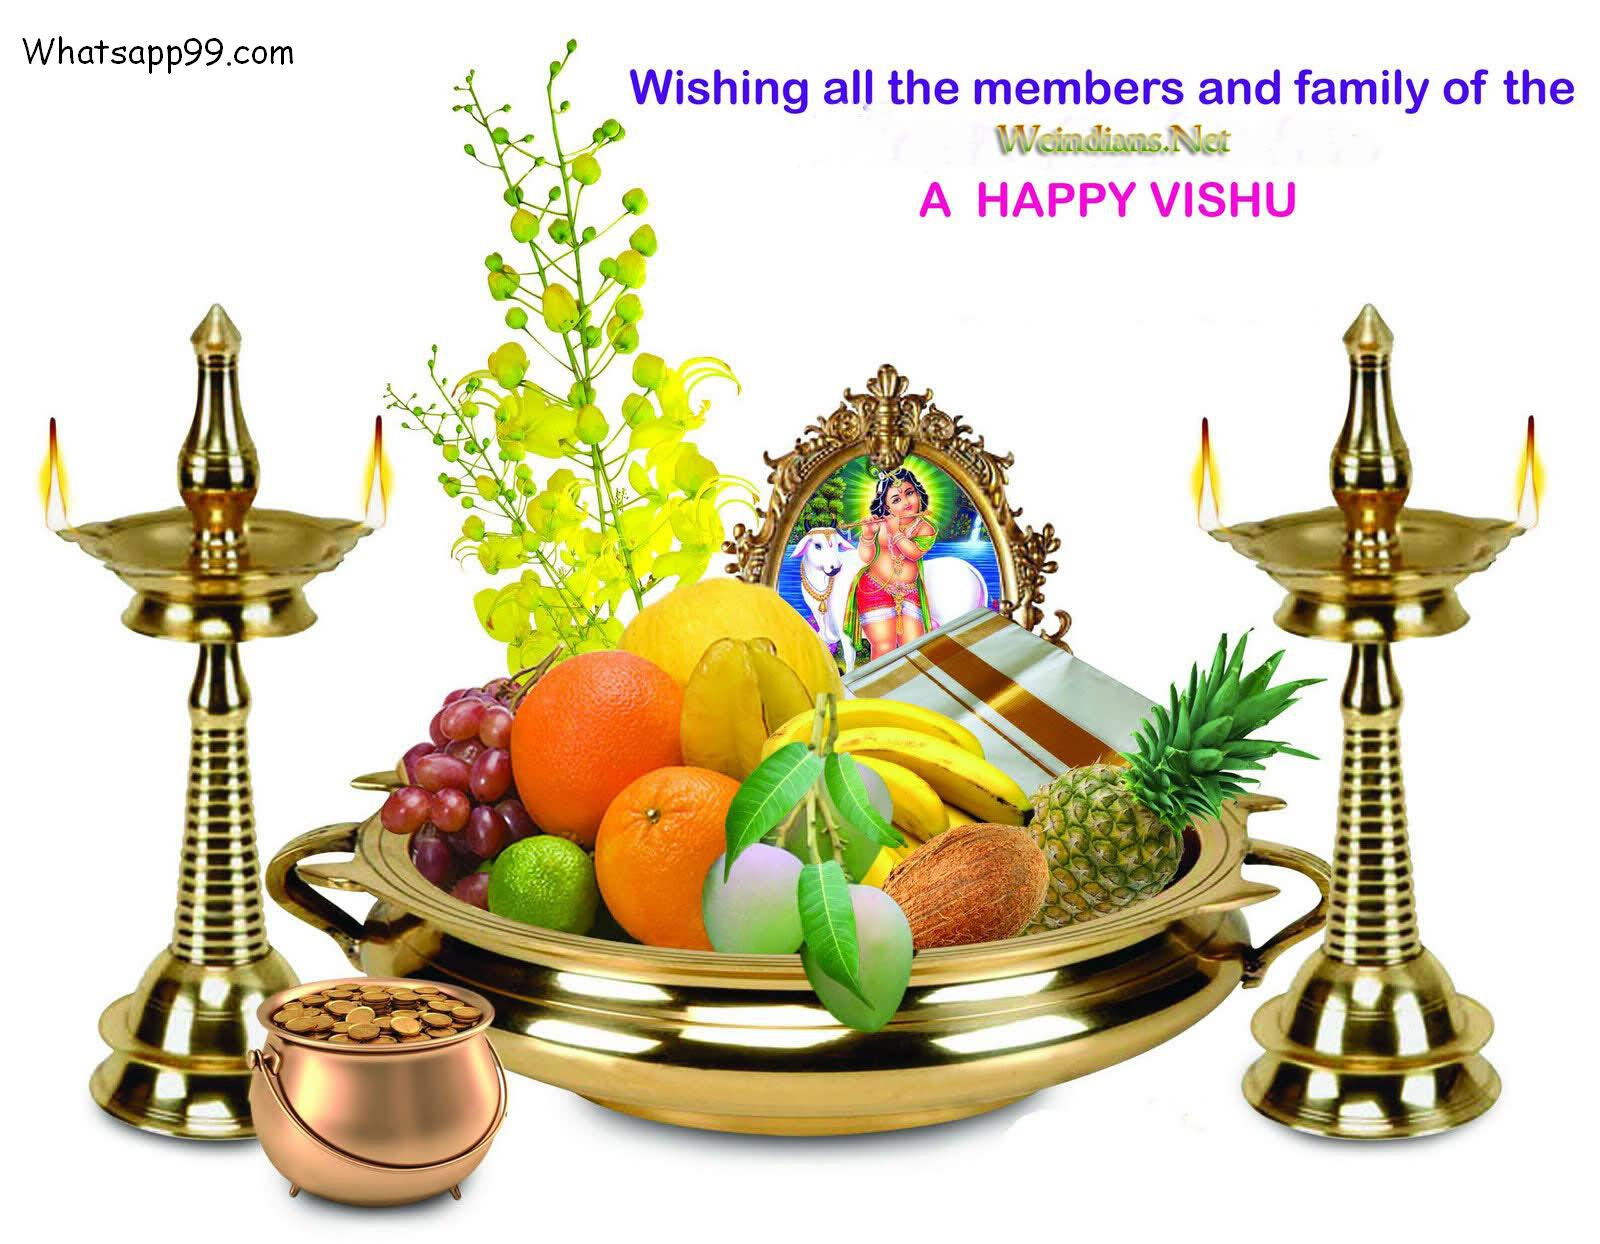 Vishu clipart #16